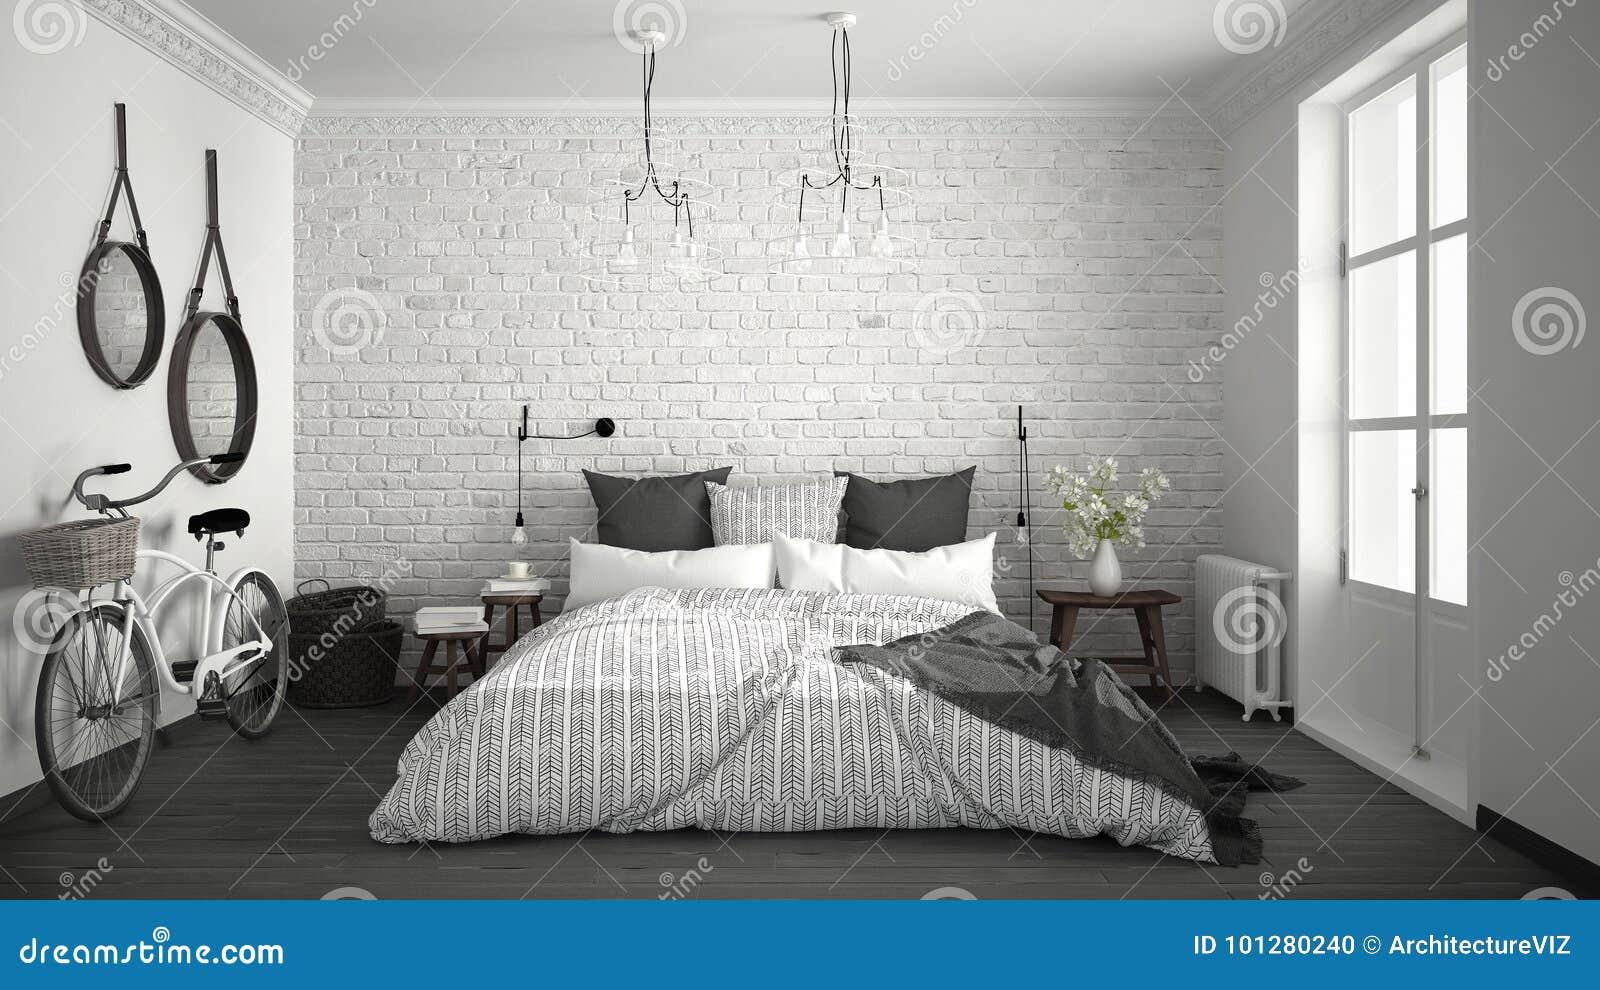 Camere Bianche E Grigie : Camera da letto moderna bianca e grigia joodsecomponisten